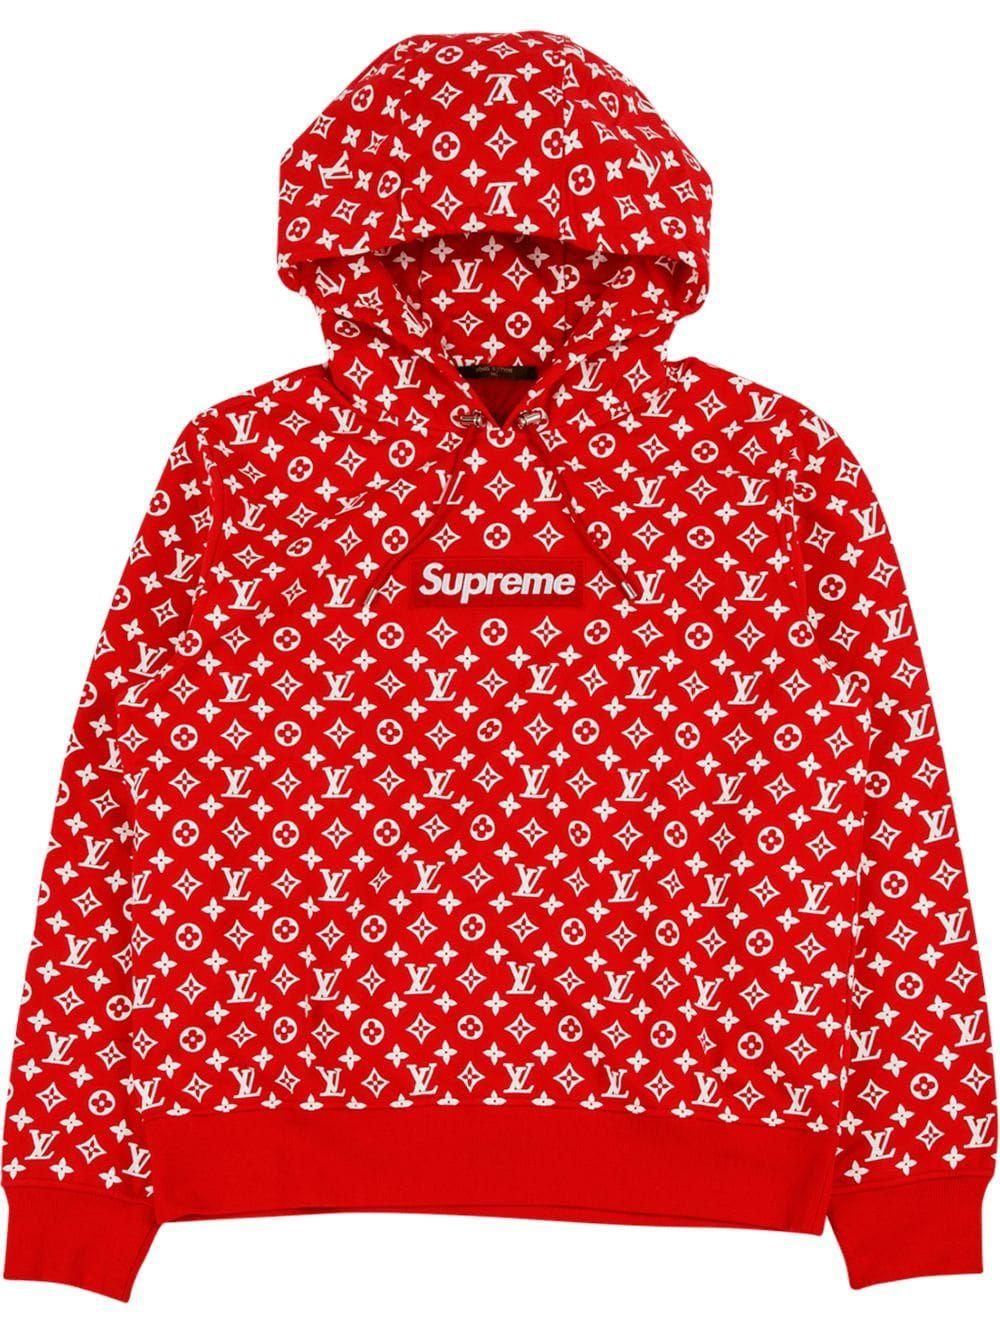 Stadium Goods Supreme x Louis Vuitton hoodie Red